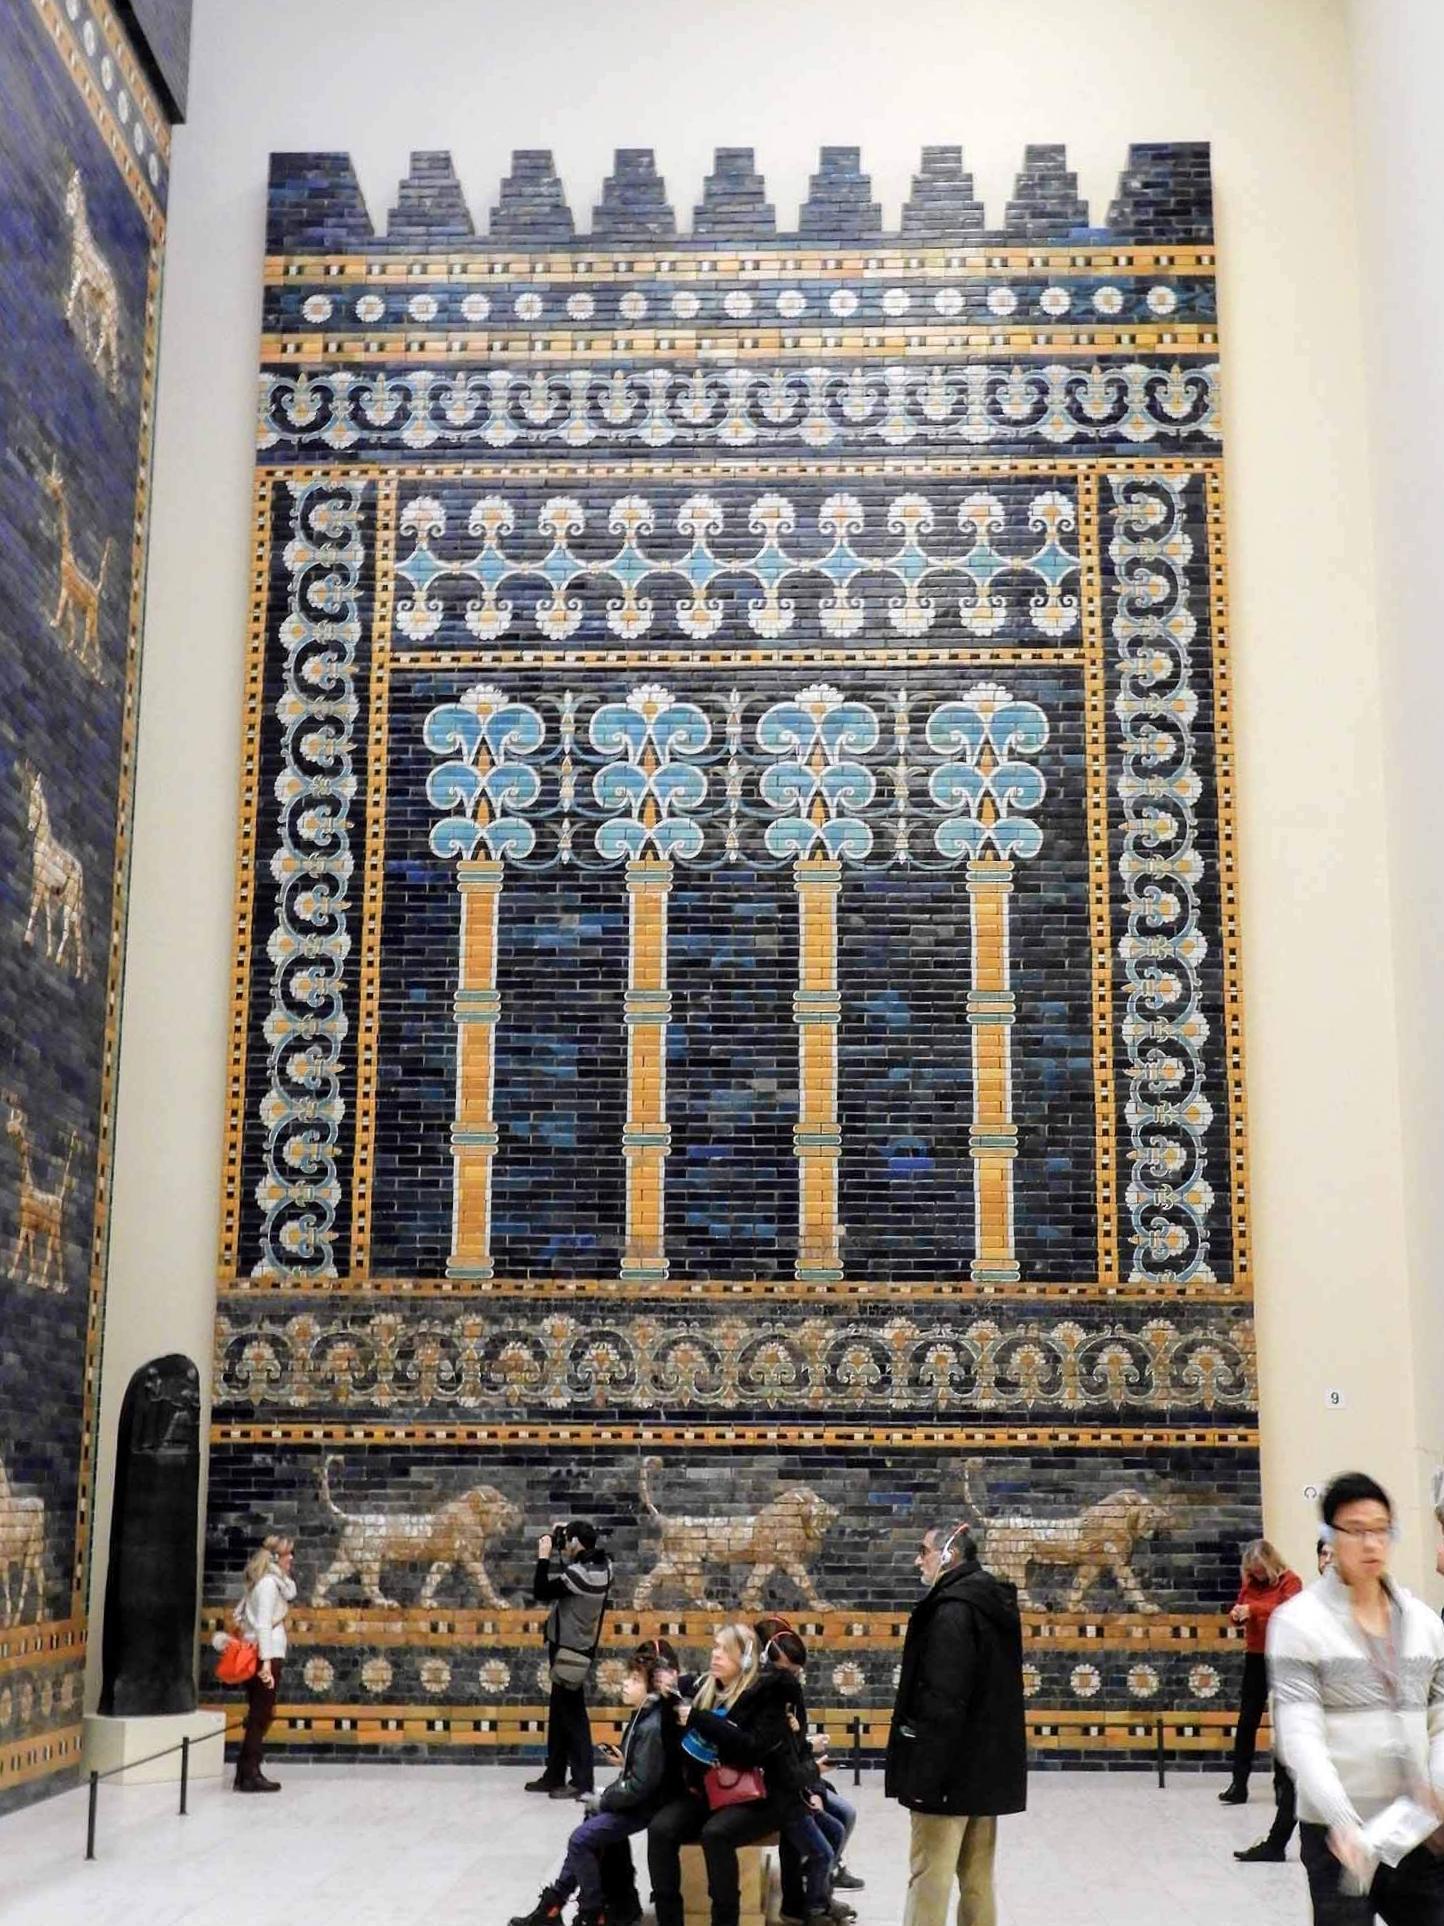 germany-berlin-pergamon-blue-tiles.jpg